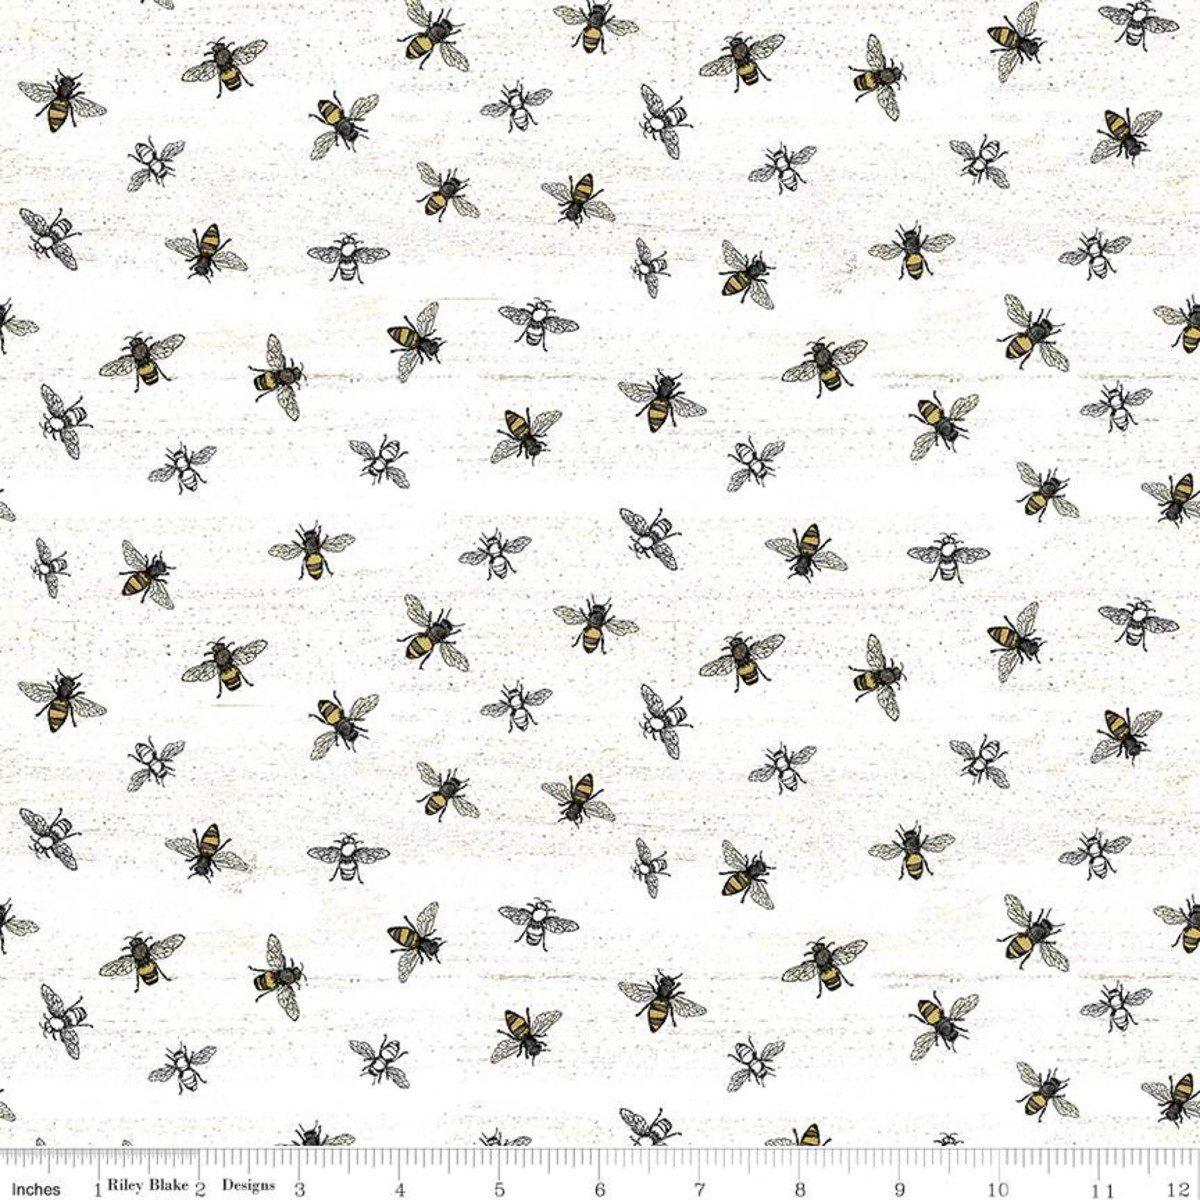 C10103-PARCHMENT bee's life